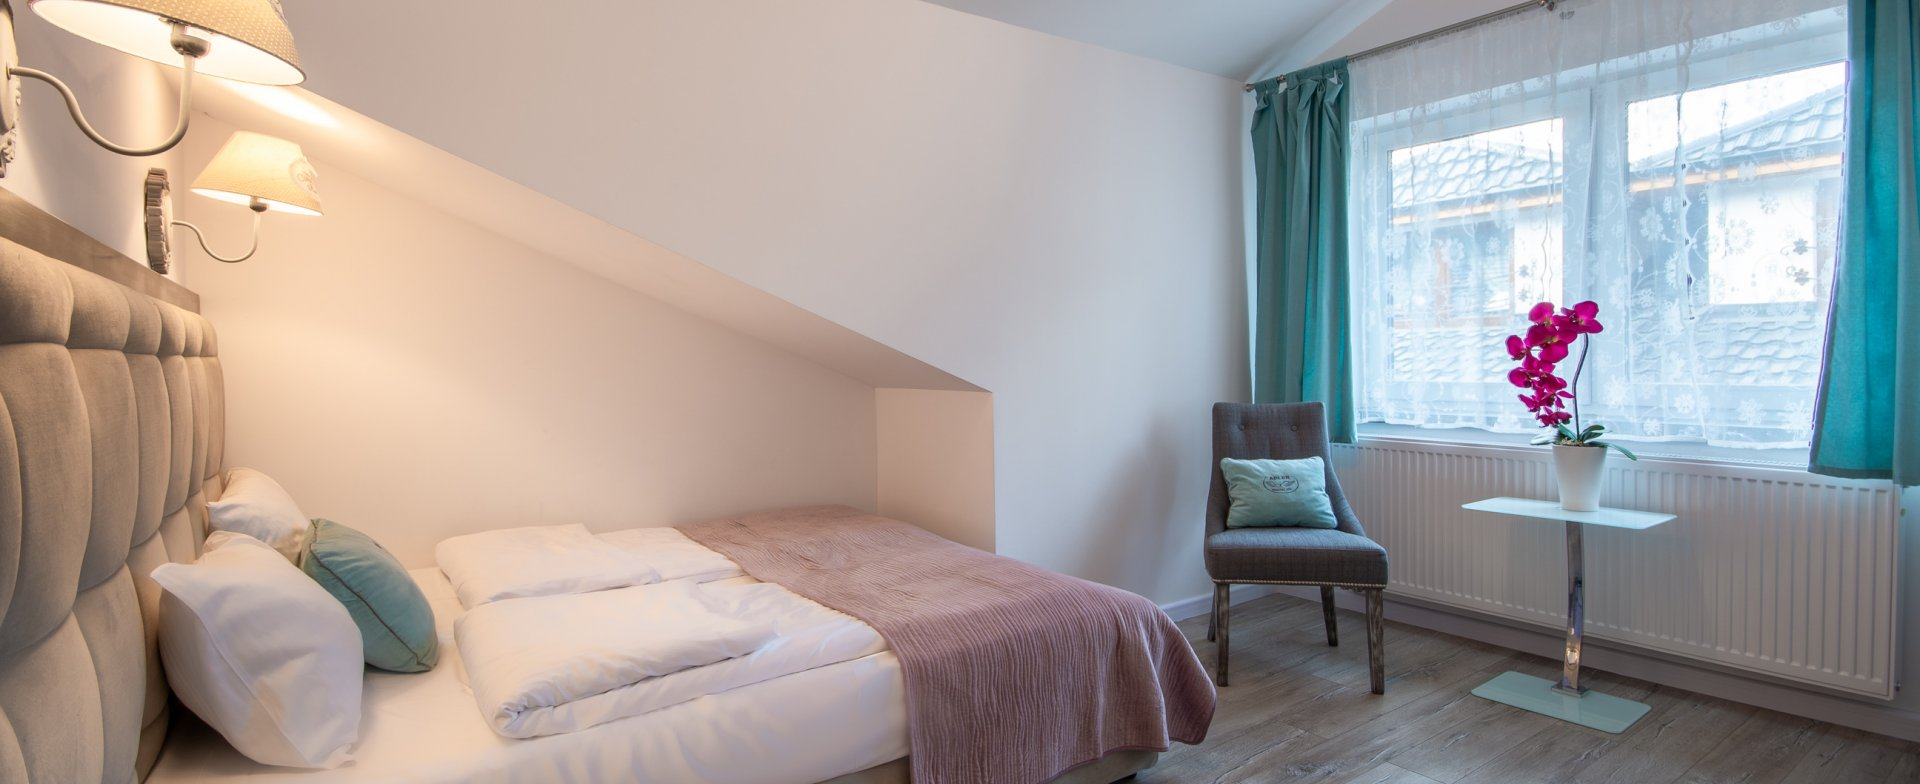 Pokój Komfort 2 os bez balkonu